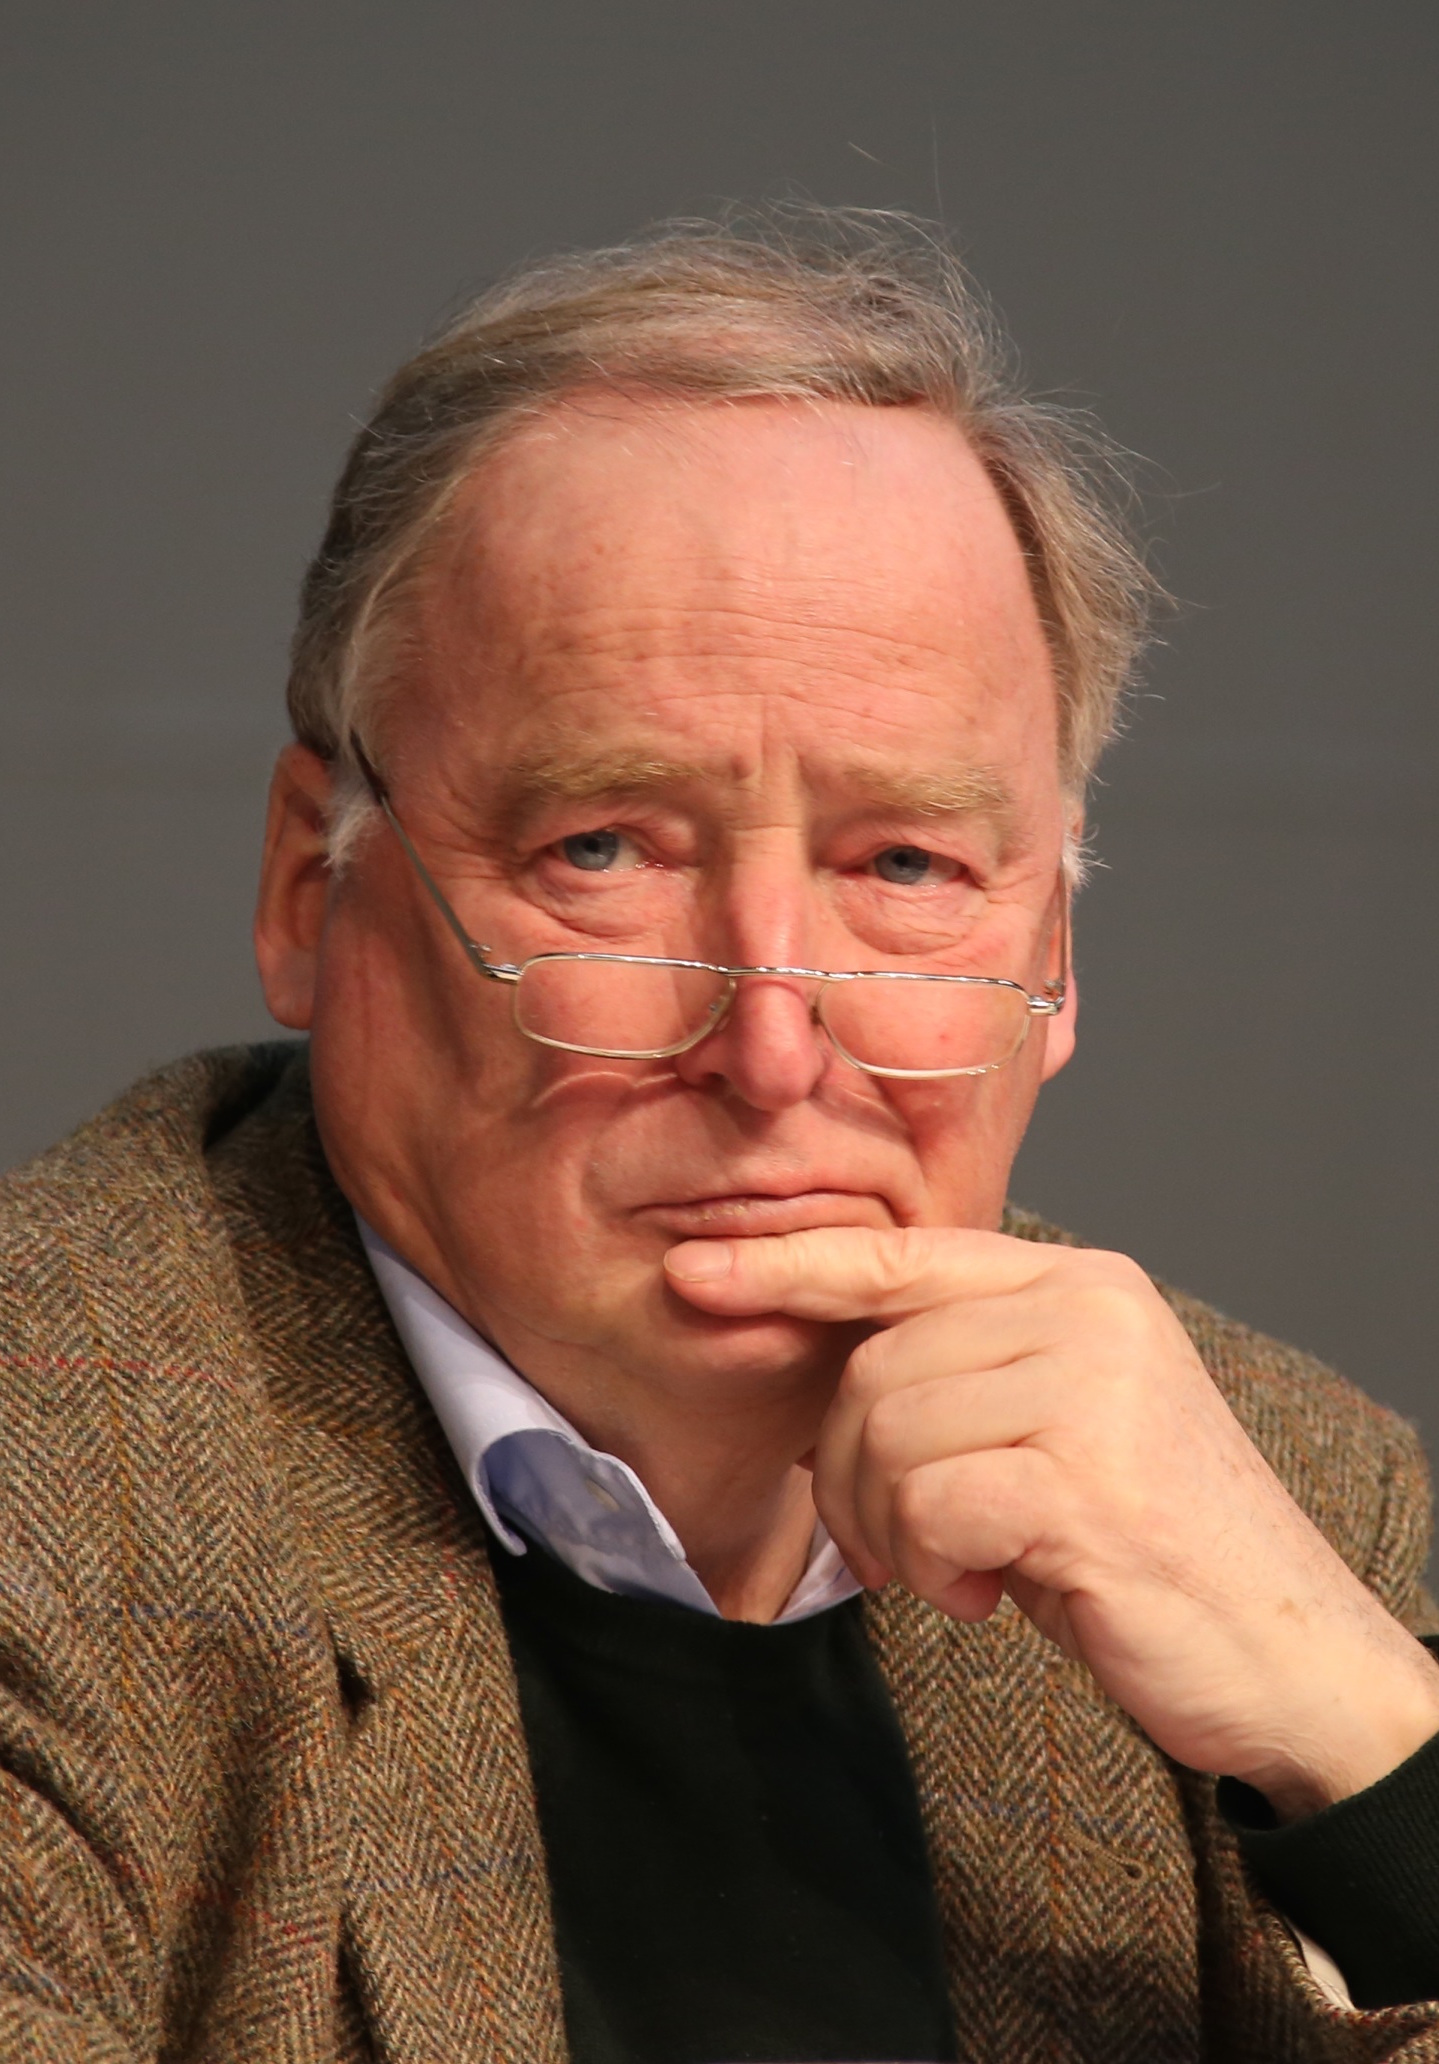 Alexander Gauland – Wikipedia